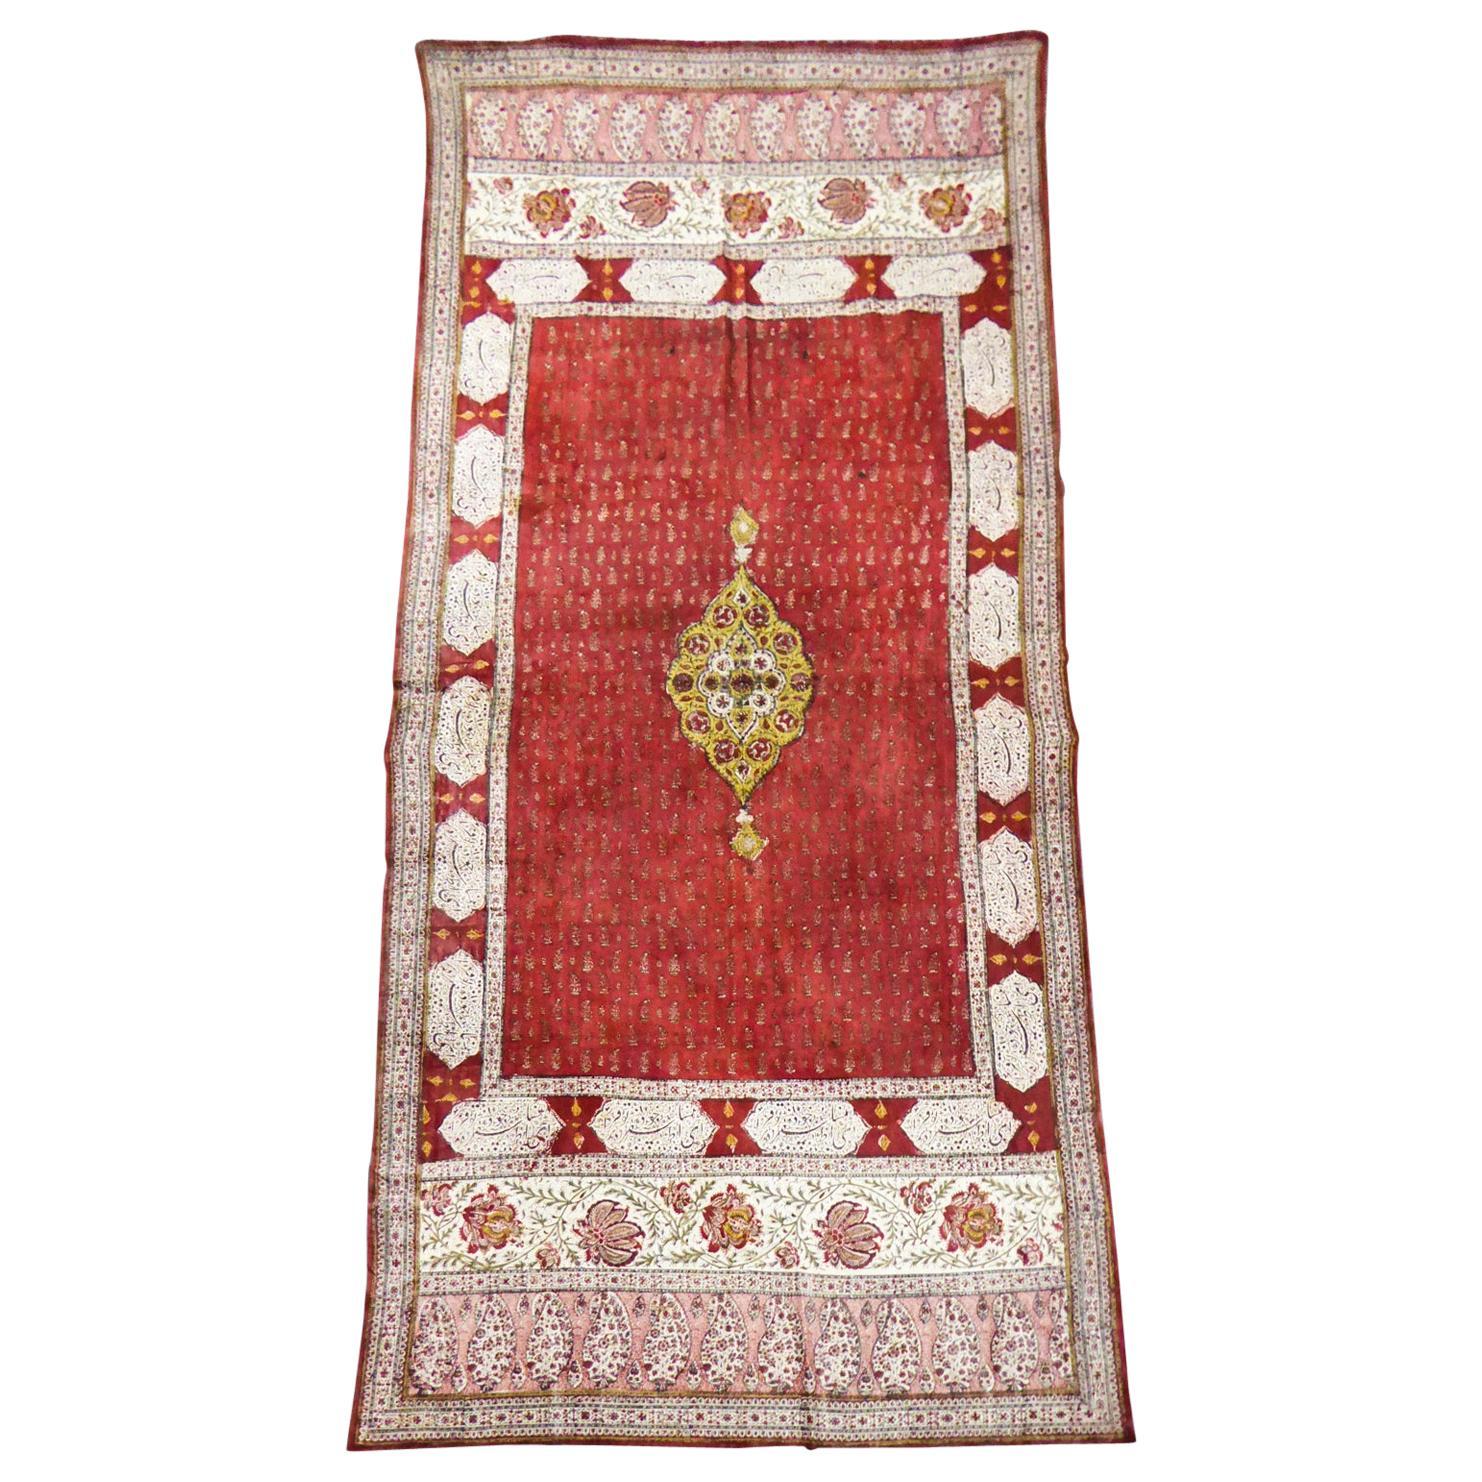 Kalamkari in glazed painted cotton - India for the Persian market - 19th century